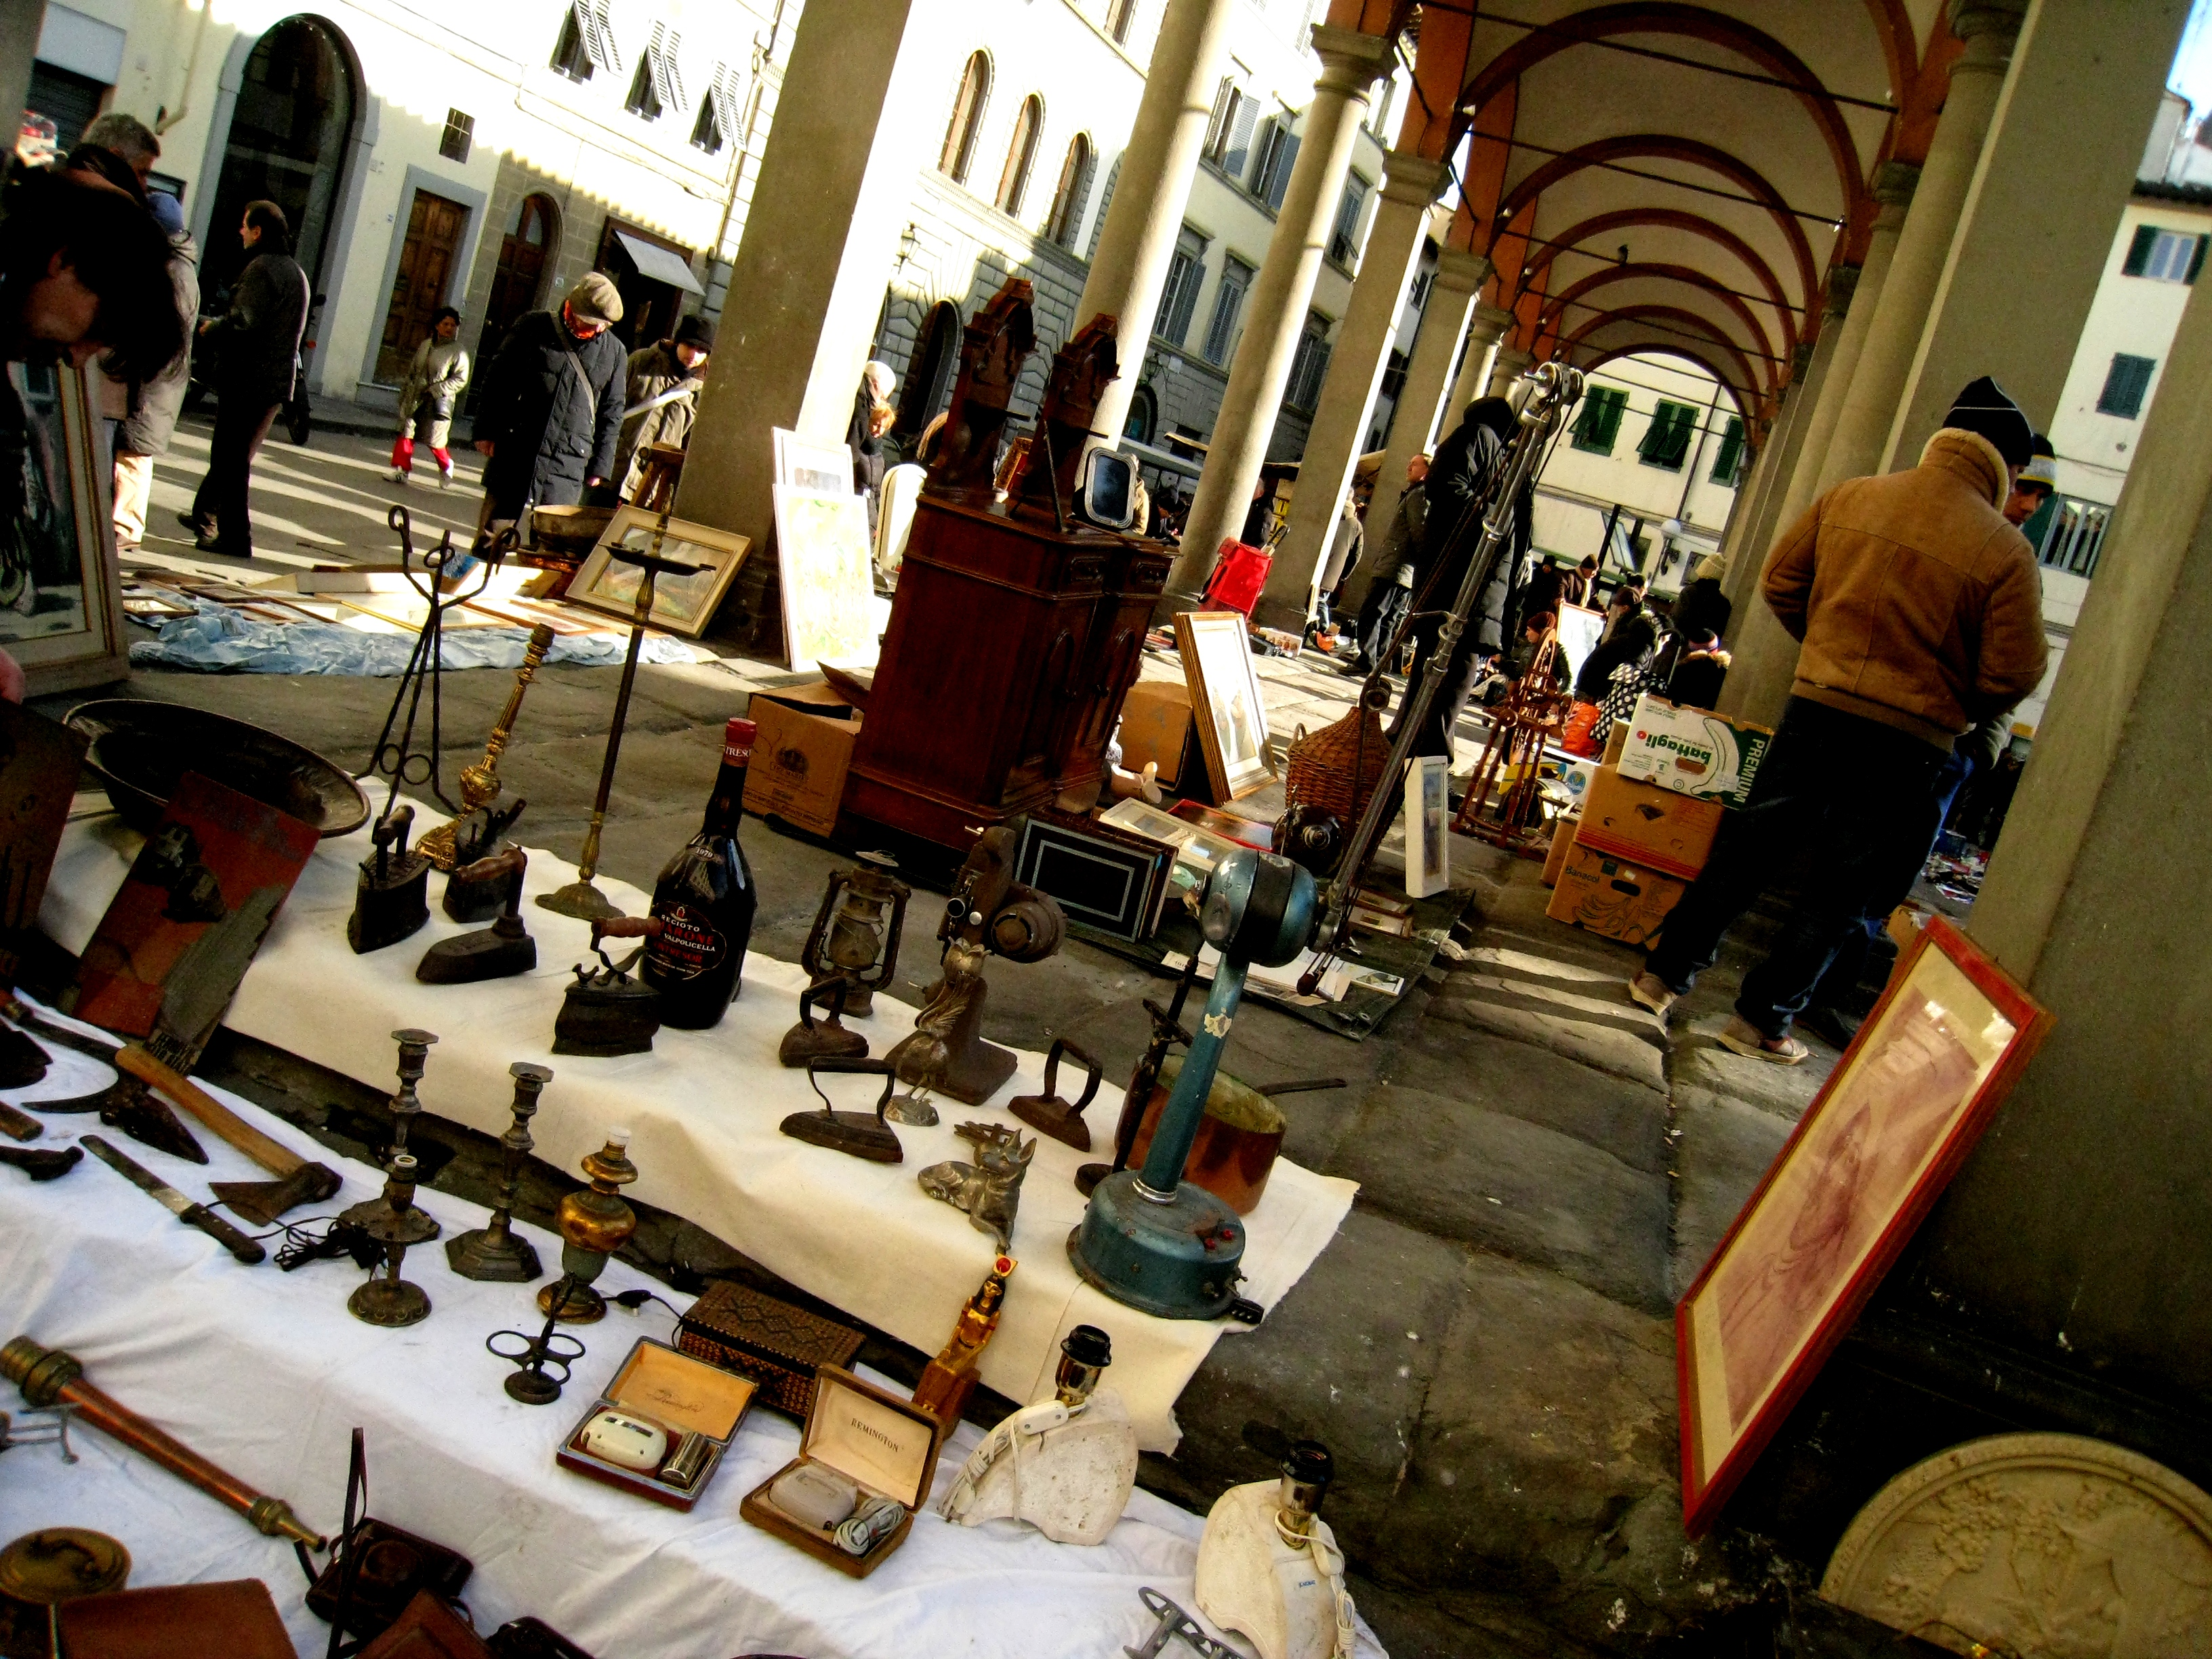 Piazza dei ciompi antique market vintagefables for Piazza dei ciompi